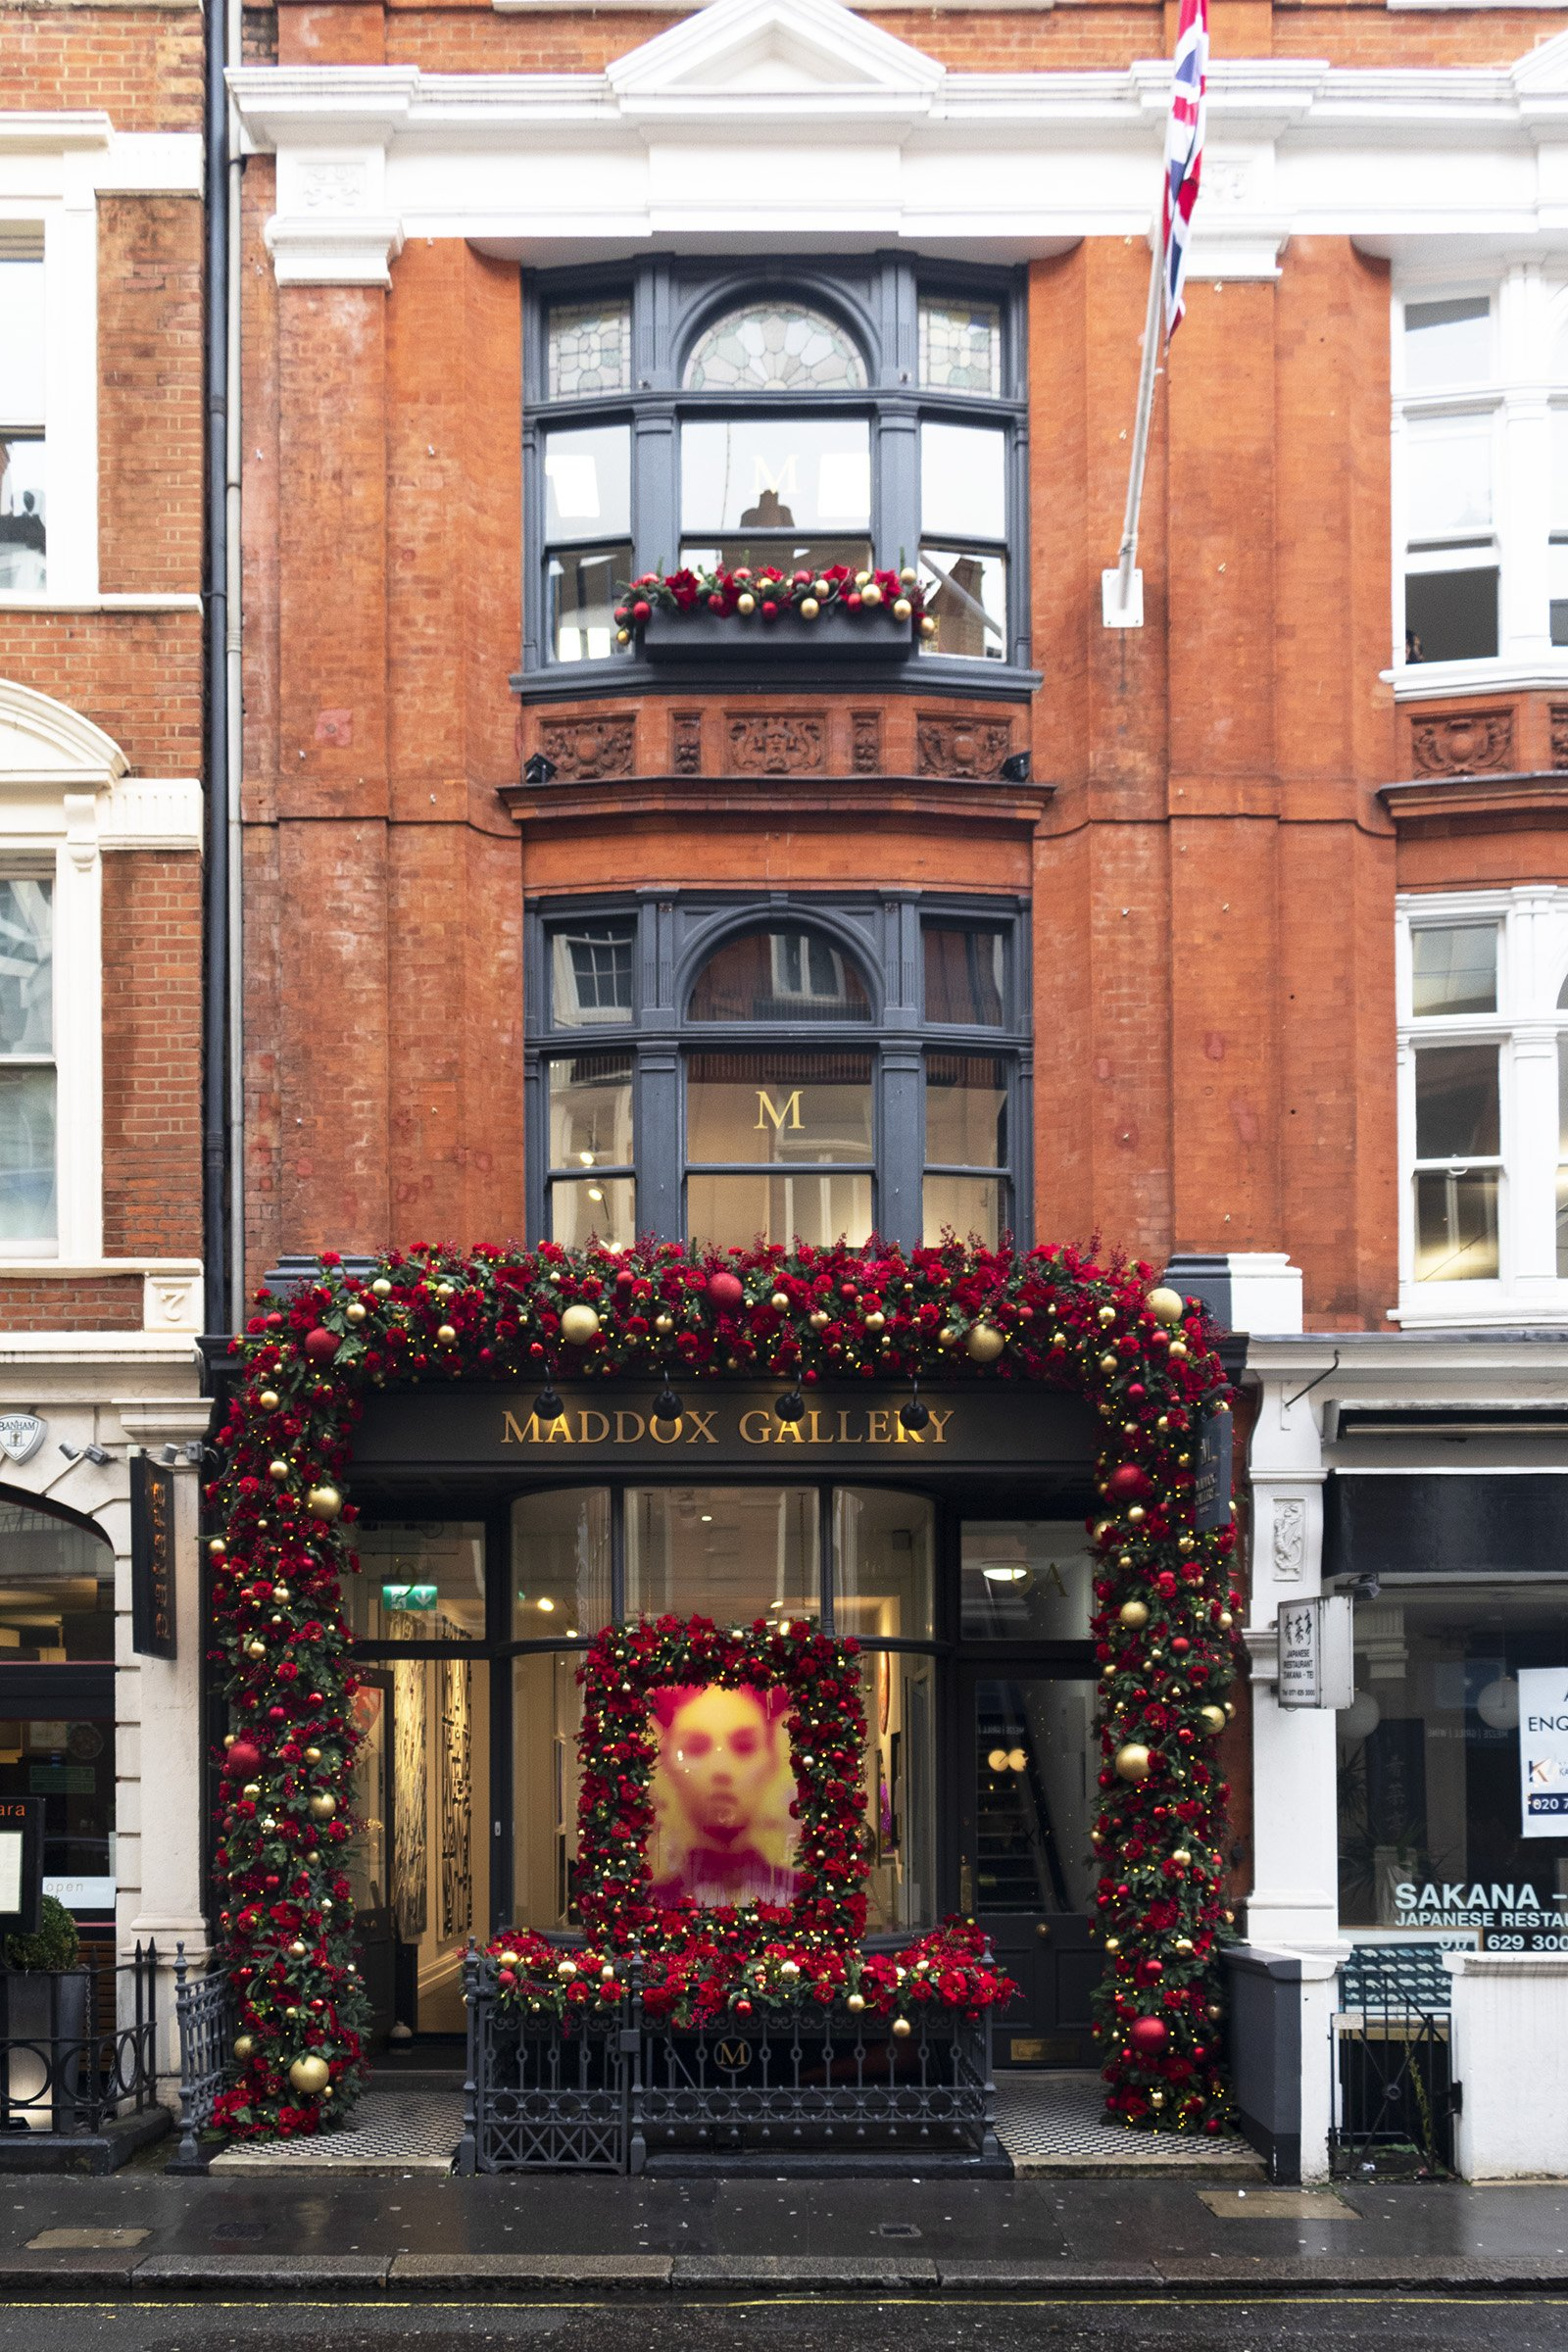 Maddox Gallery, Mayfair, London